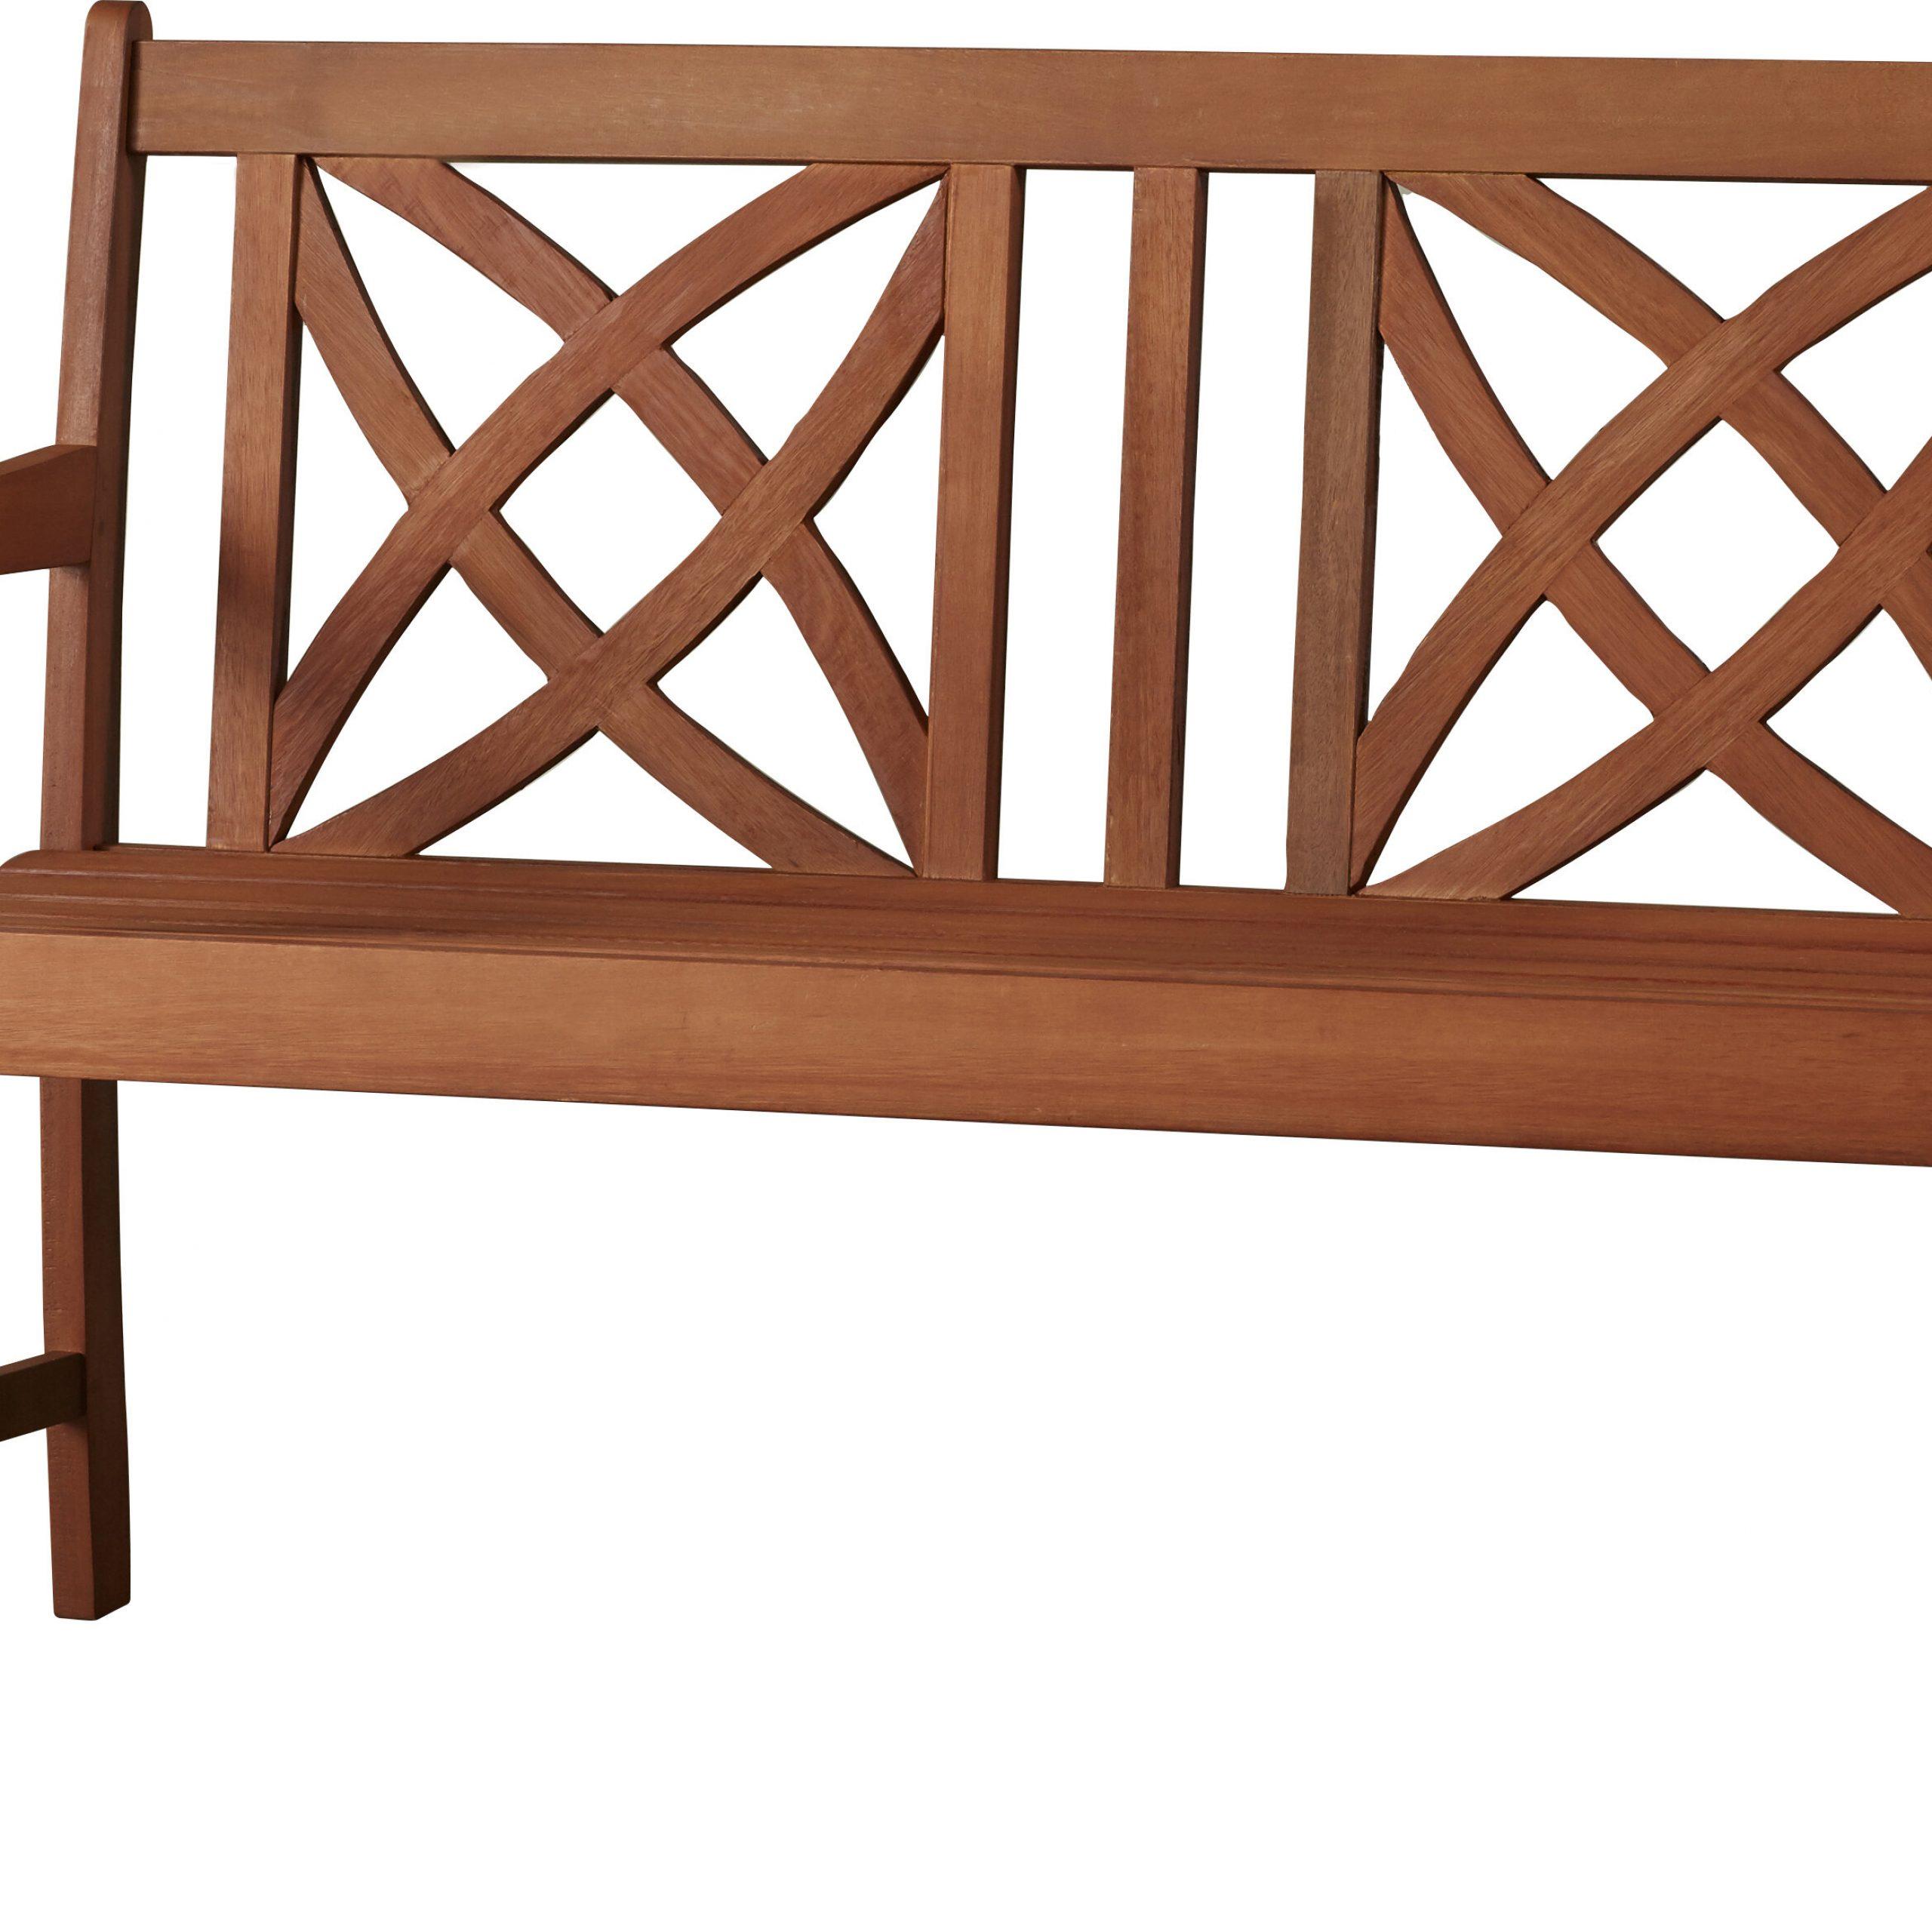 Maliyah Solid Wood Garden Bench Regarding Avoca Wood Garden Benches (View 3 of 25)